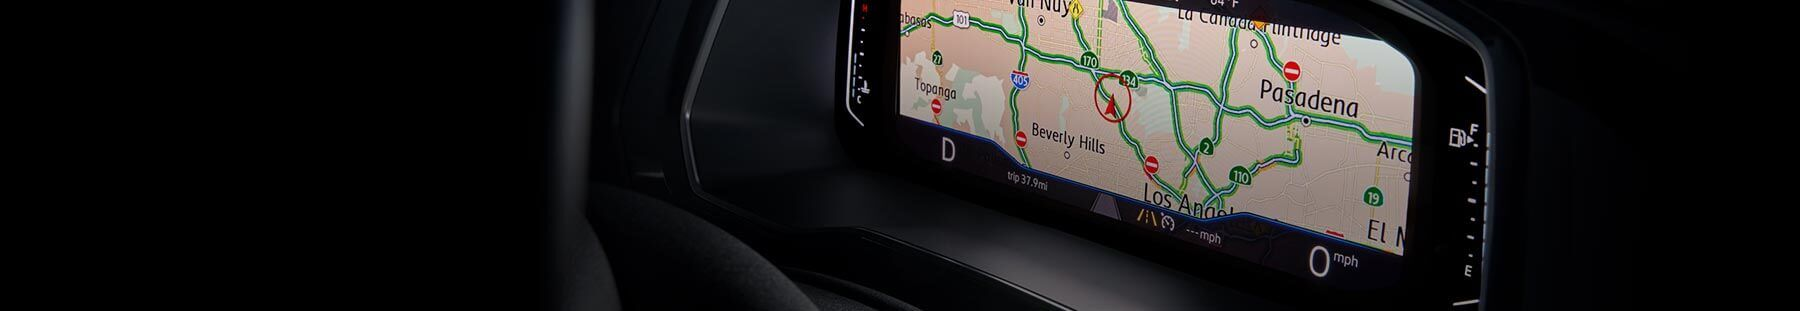 All New Volkswagen Jetta in Glendale, CA